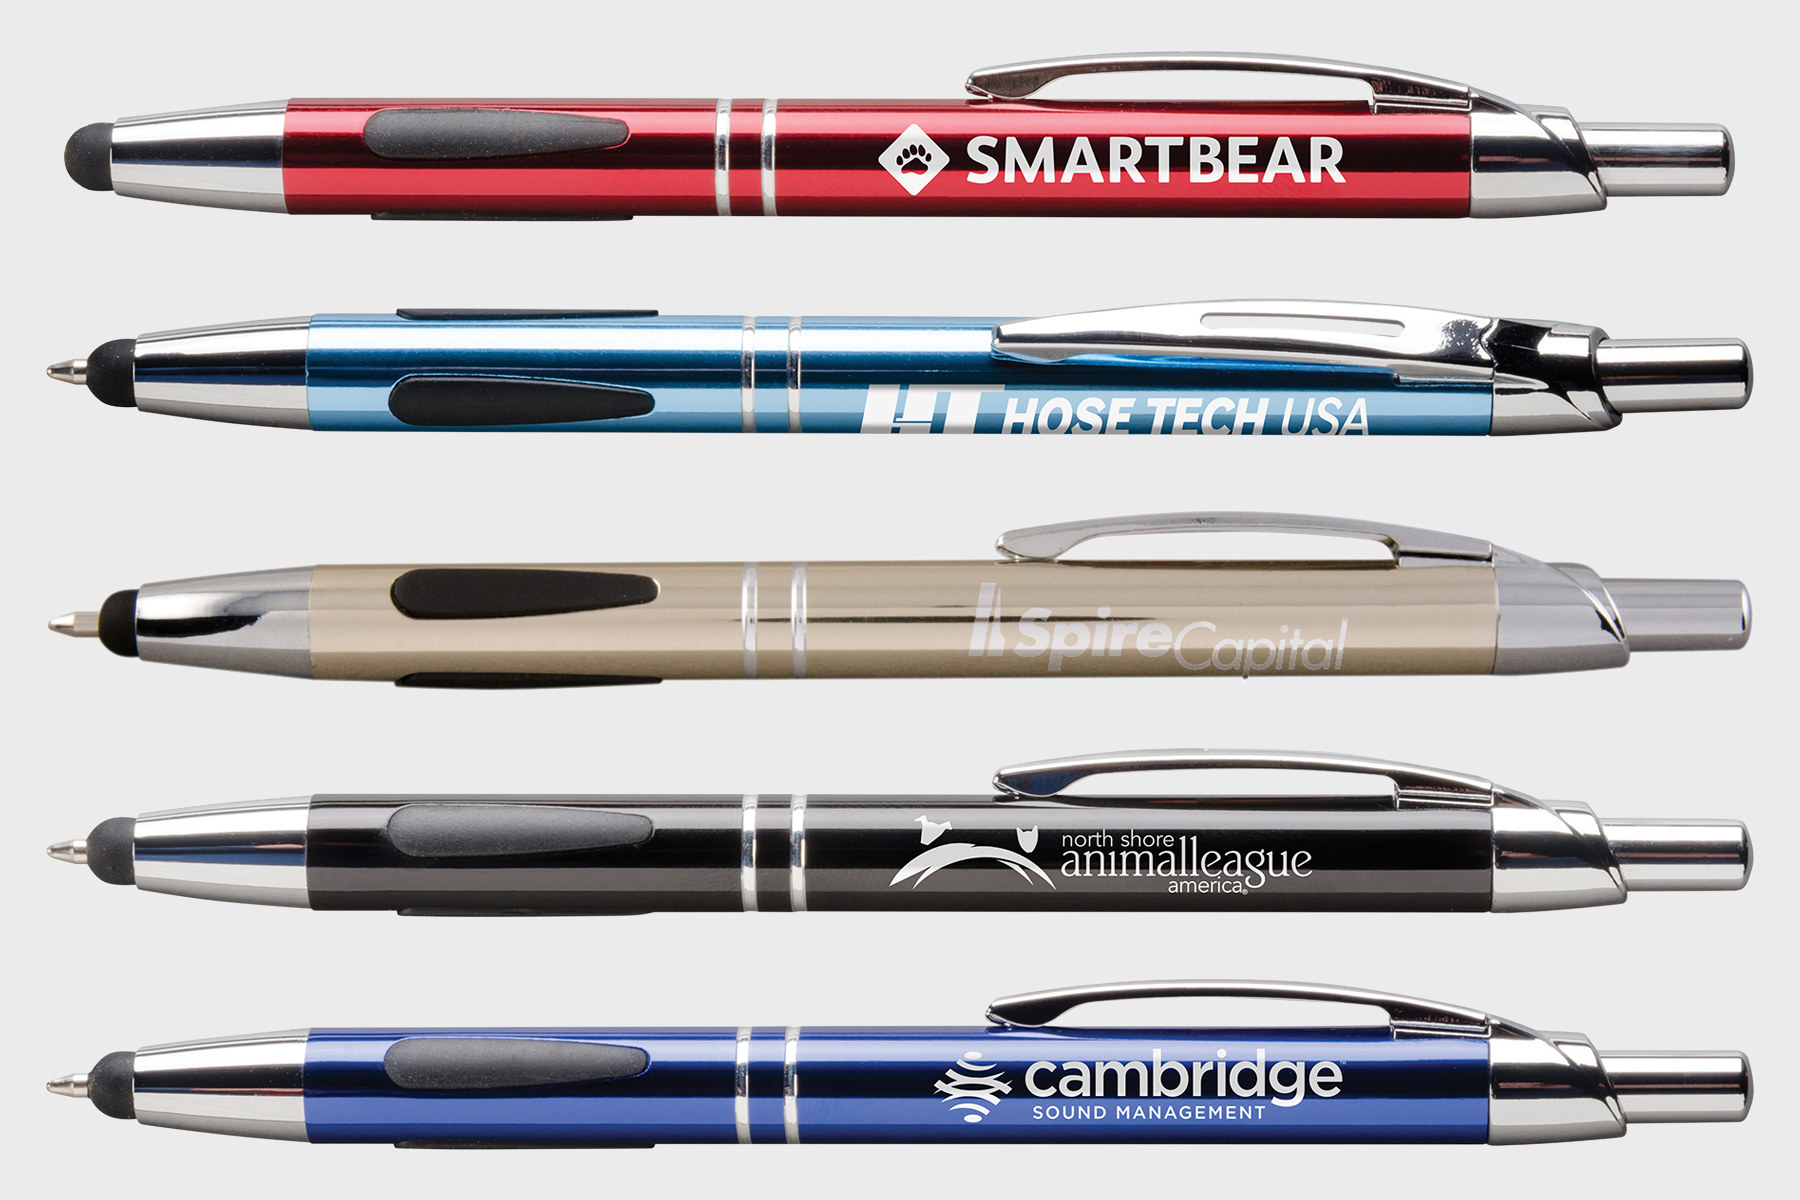 Best branded Pen